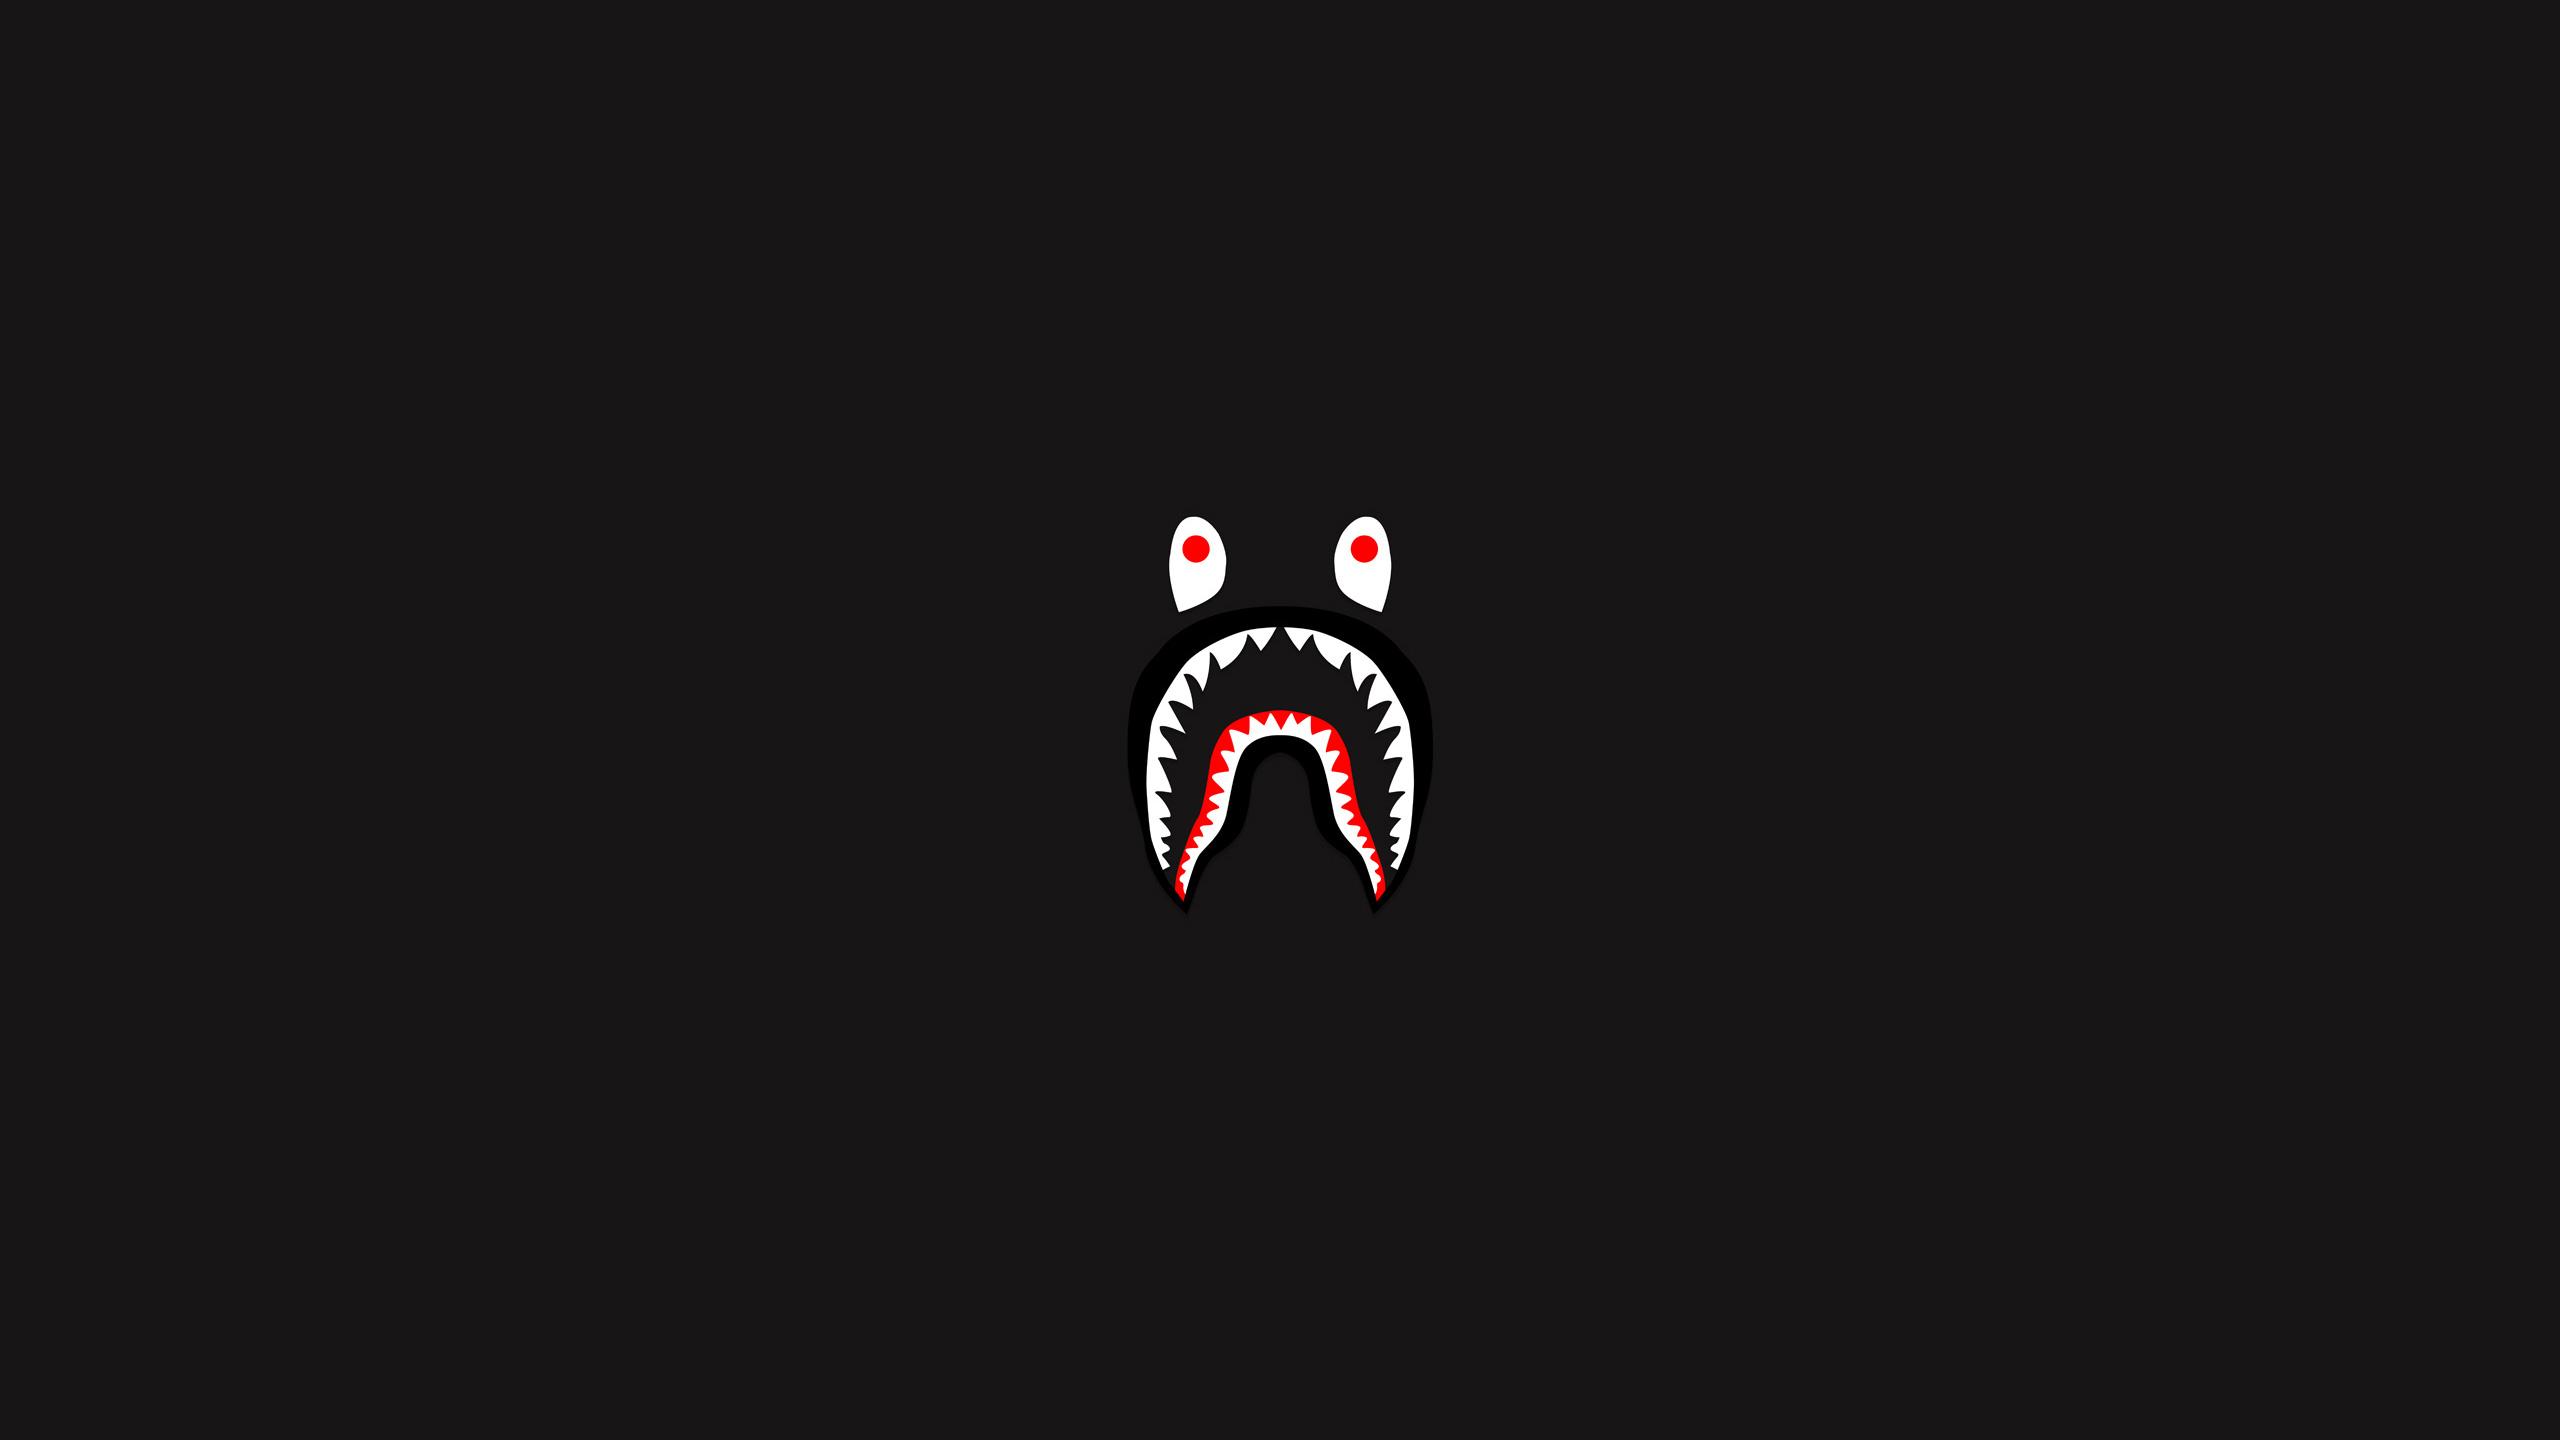 Bape Shark Wallpaper